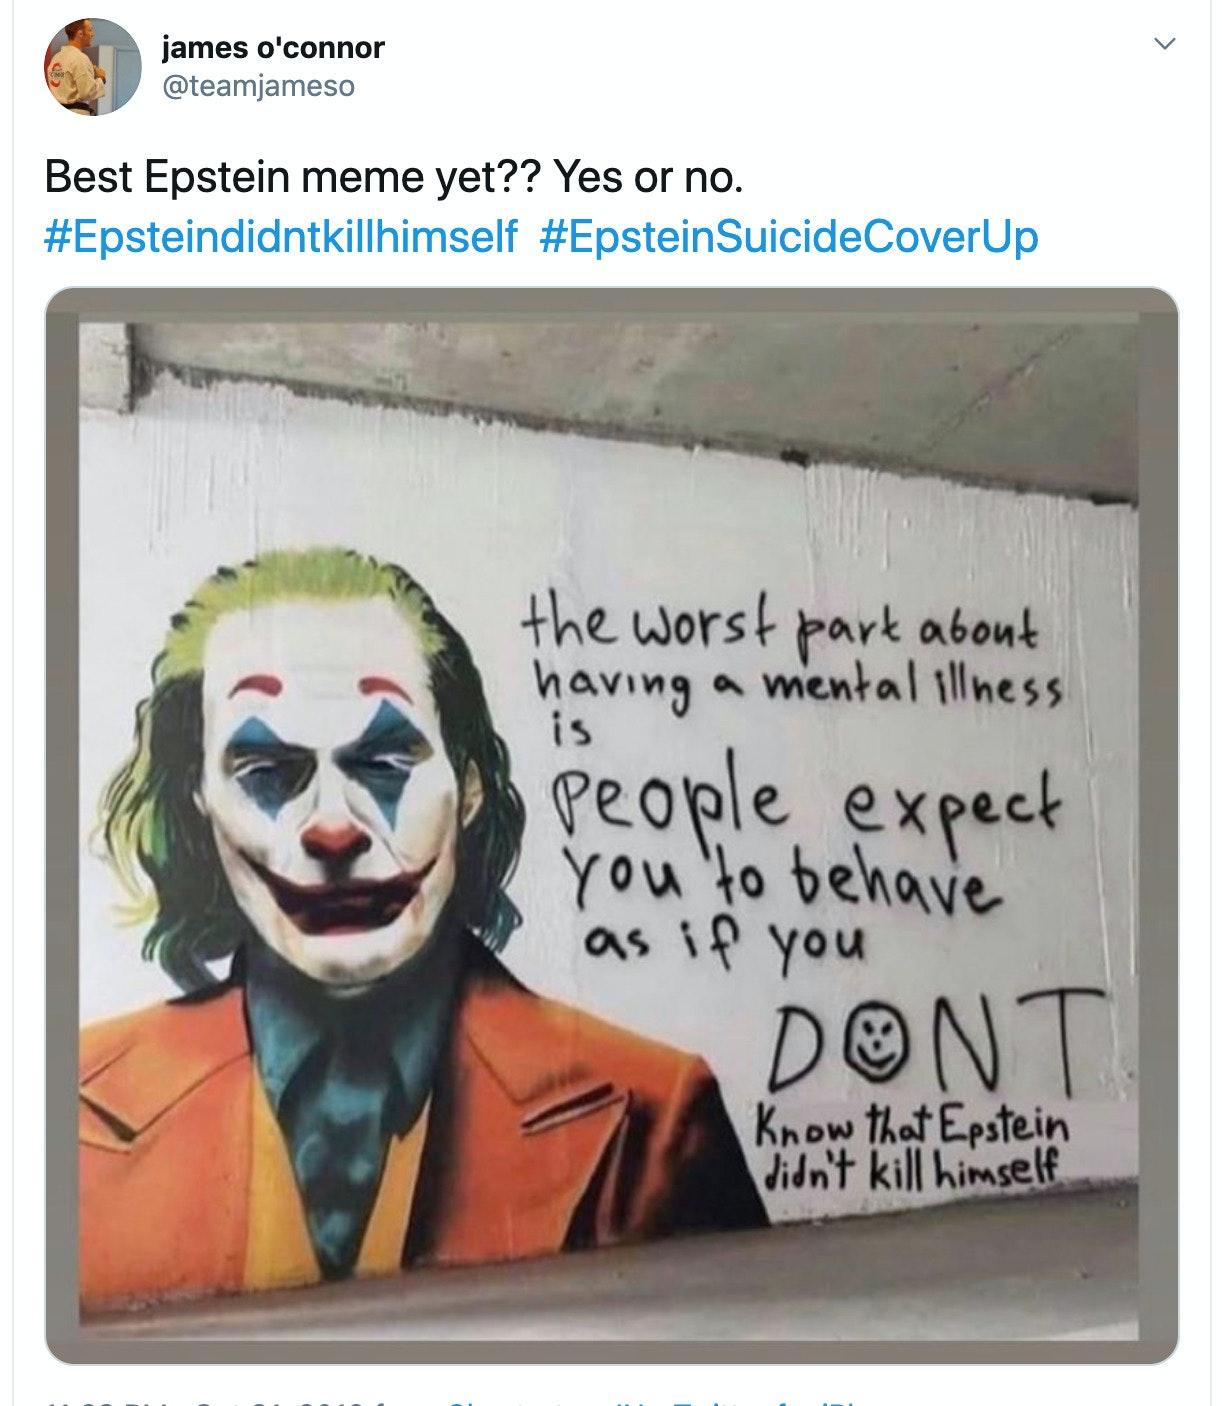 jeffrey epstein memes, picture of joker saying epstein didn't kill himself